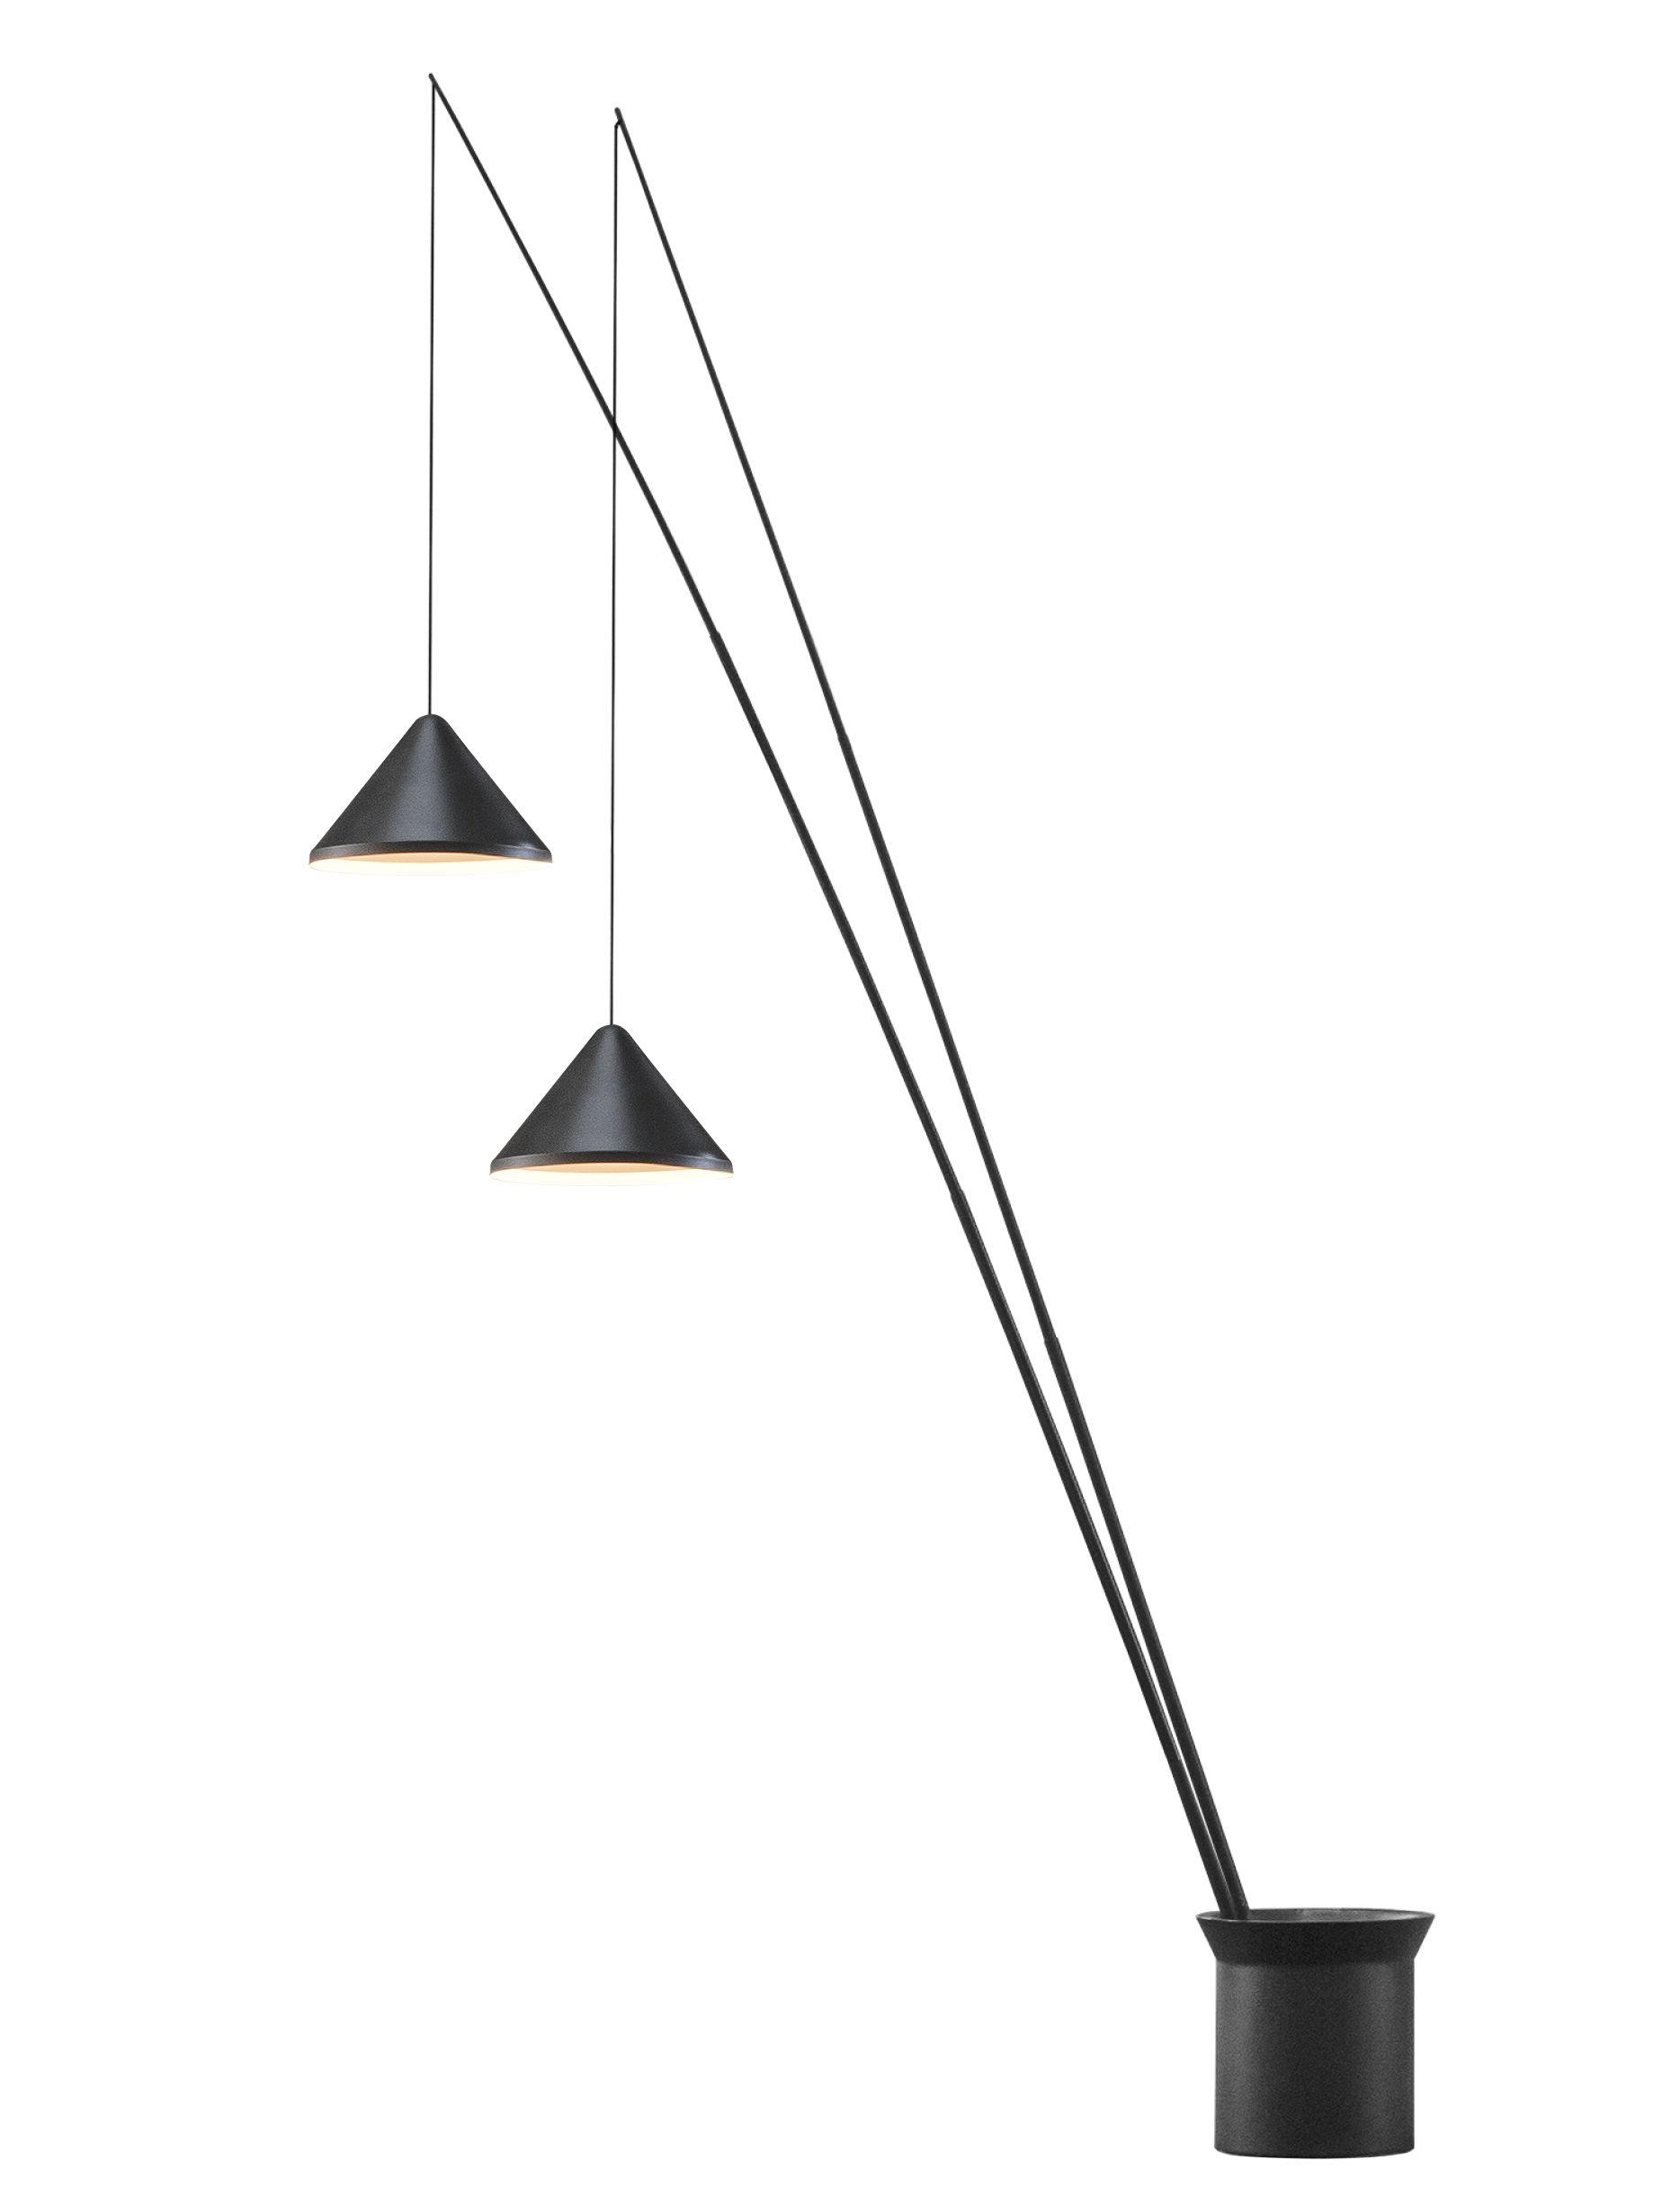 Illuminazione - Lampade da terra - Lampada a stelo North LED - / 2 paralumi regolabili - Ø 40 cm di Vibia - Ø 40 cm / Grafite opaco - Acciaio, Alluminio, Fibra di carbonio